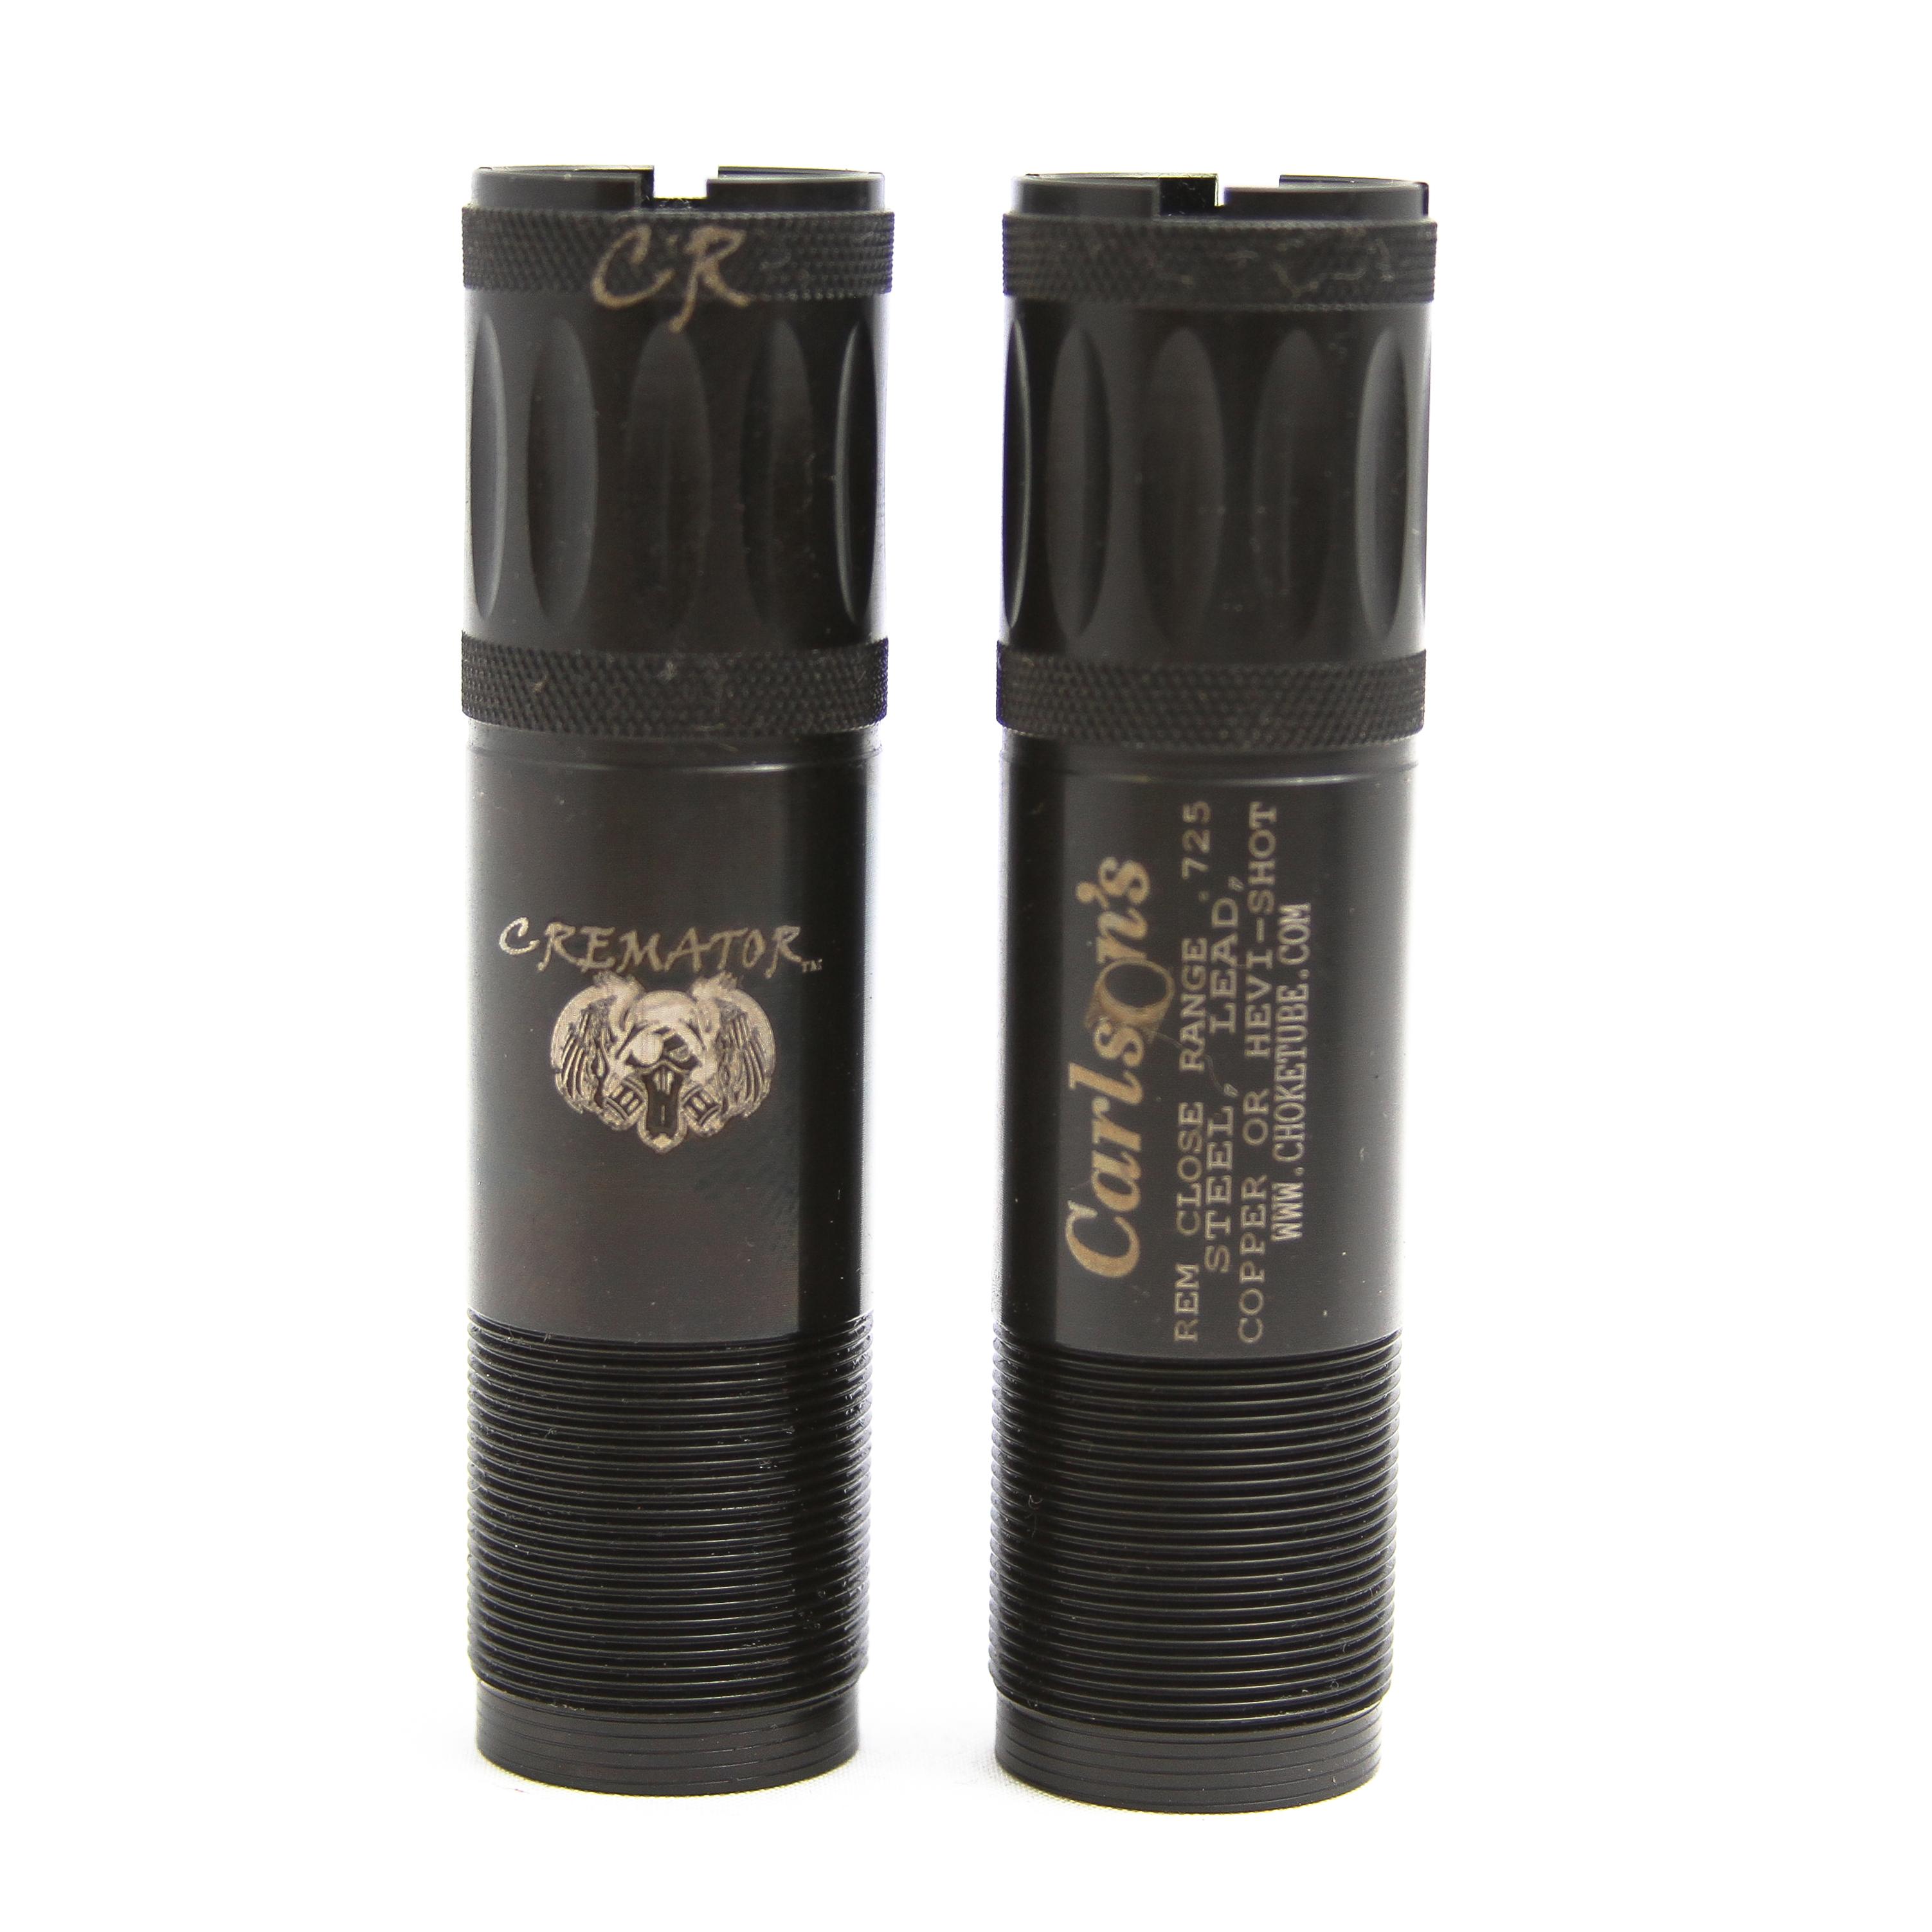 gc1 0ps us/original/opplanet-carlson-s-choke-tubes